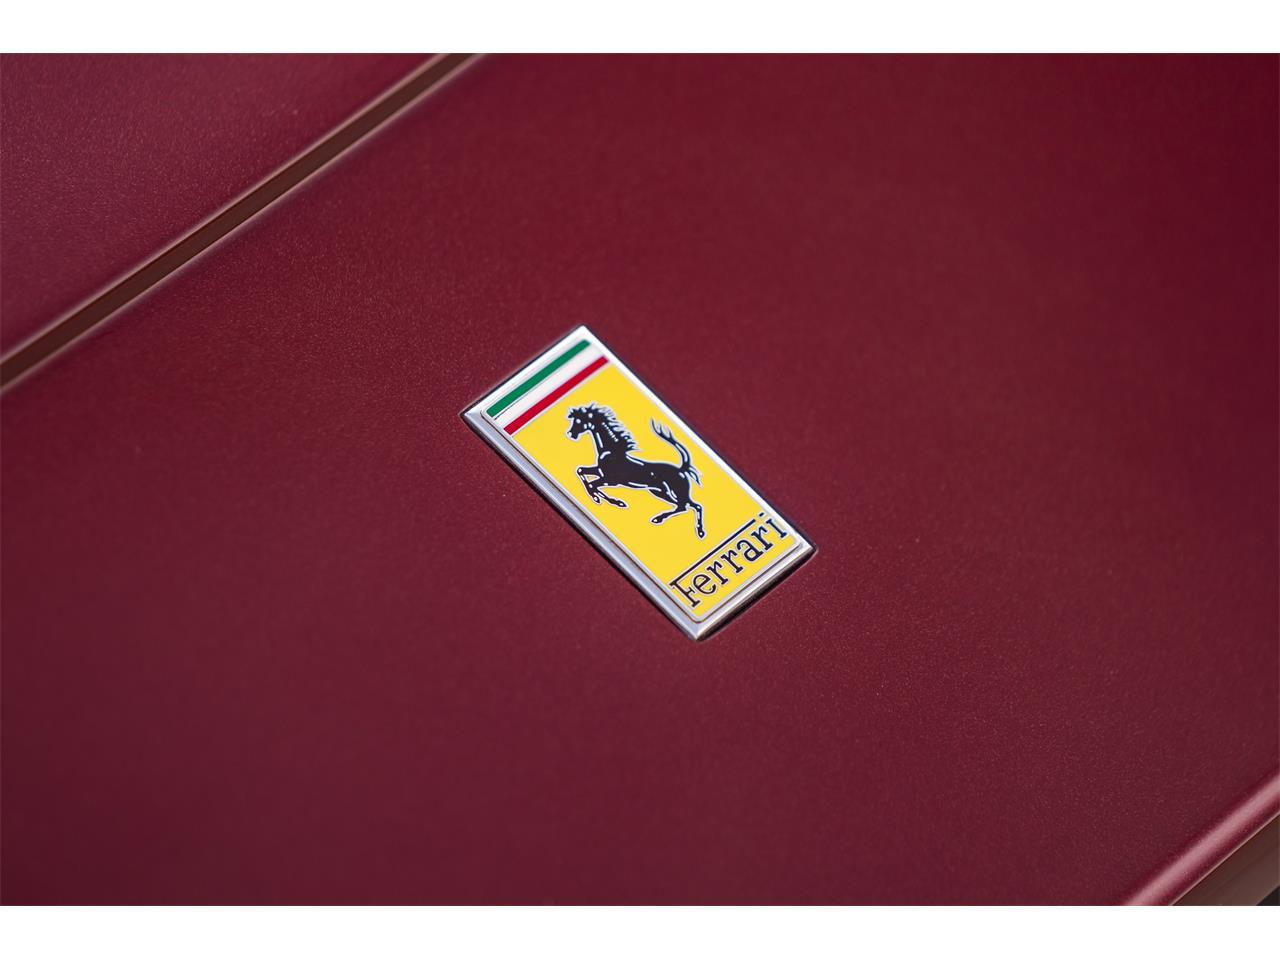 Large Picture of Classic '72 Ferrari 365 GTB/4 Daytona located in Pontiac Michigan - $725,000.00 - QL32